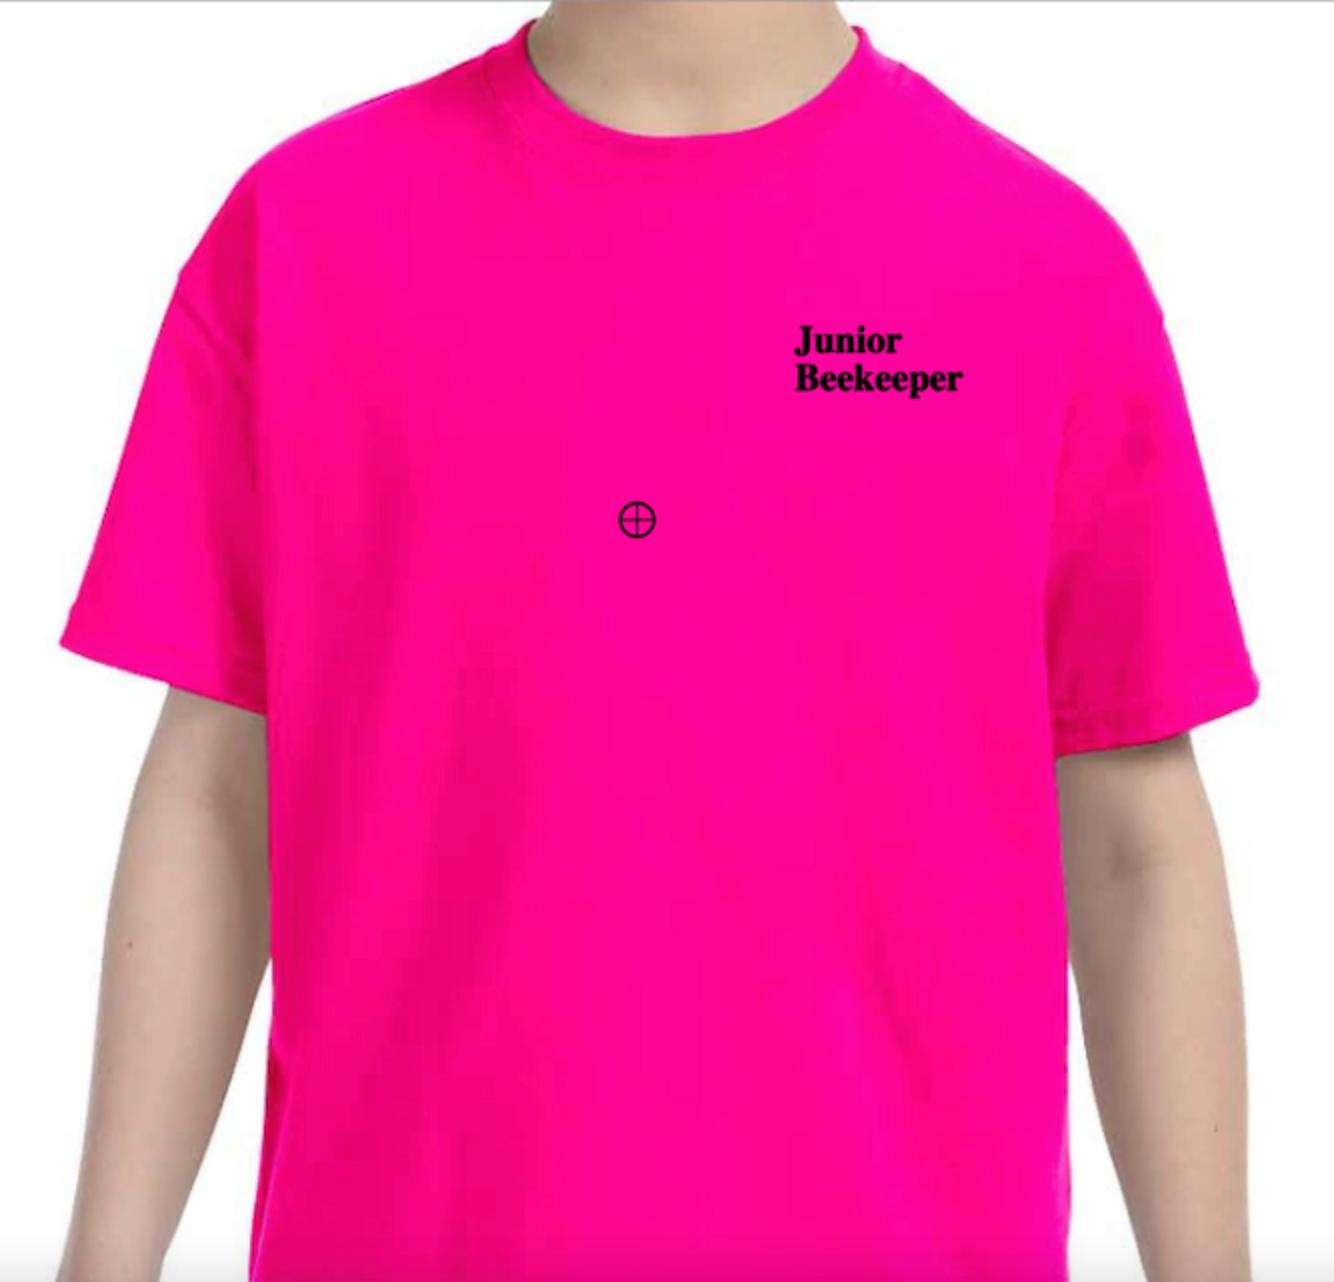 Junior Beekeeper Adult T-Shirt